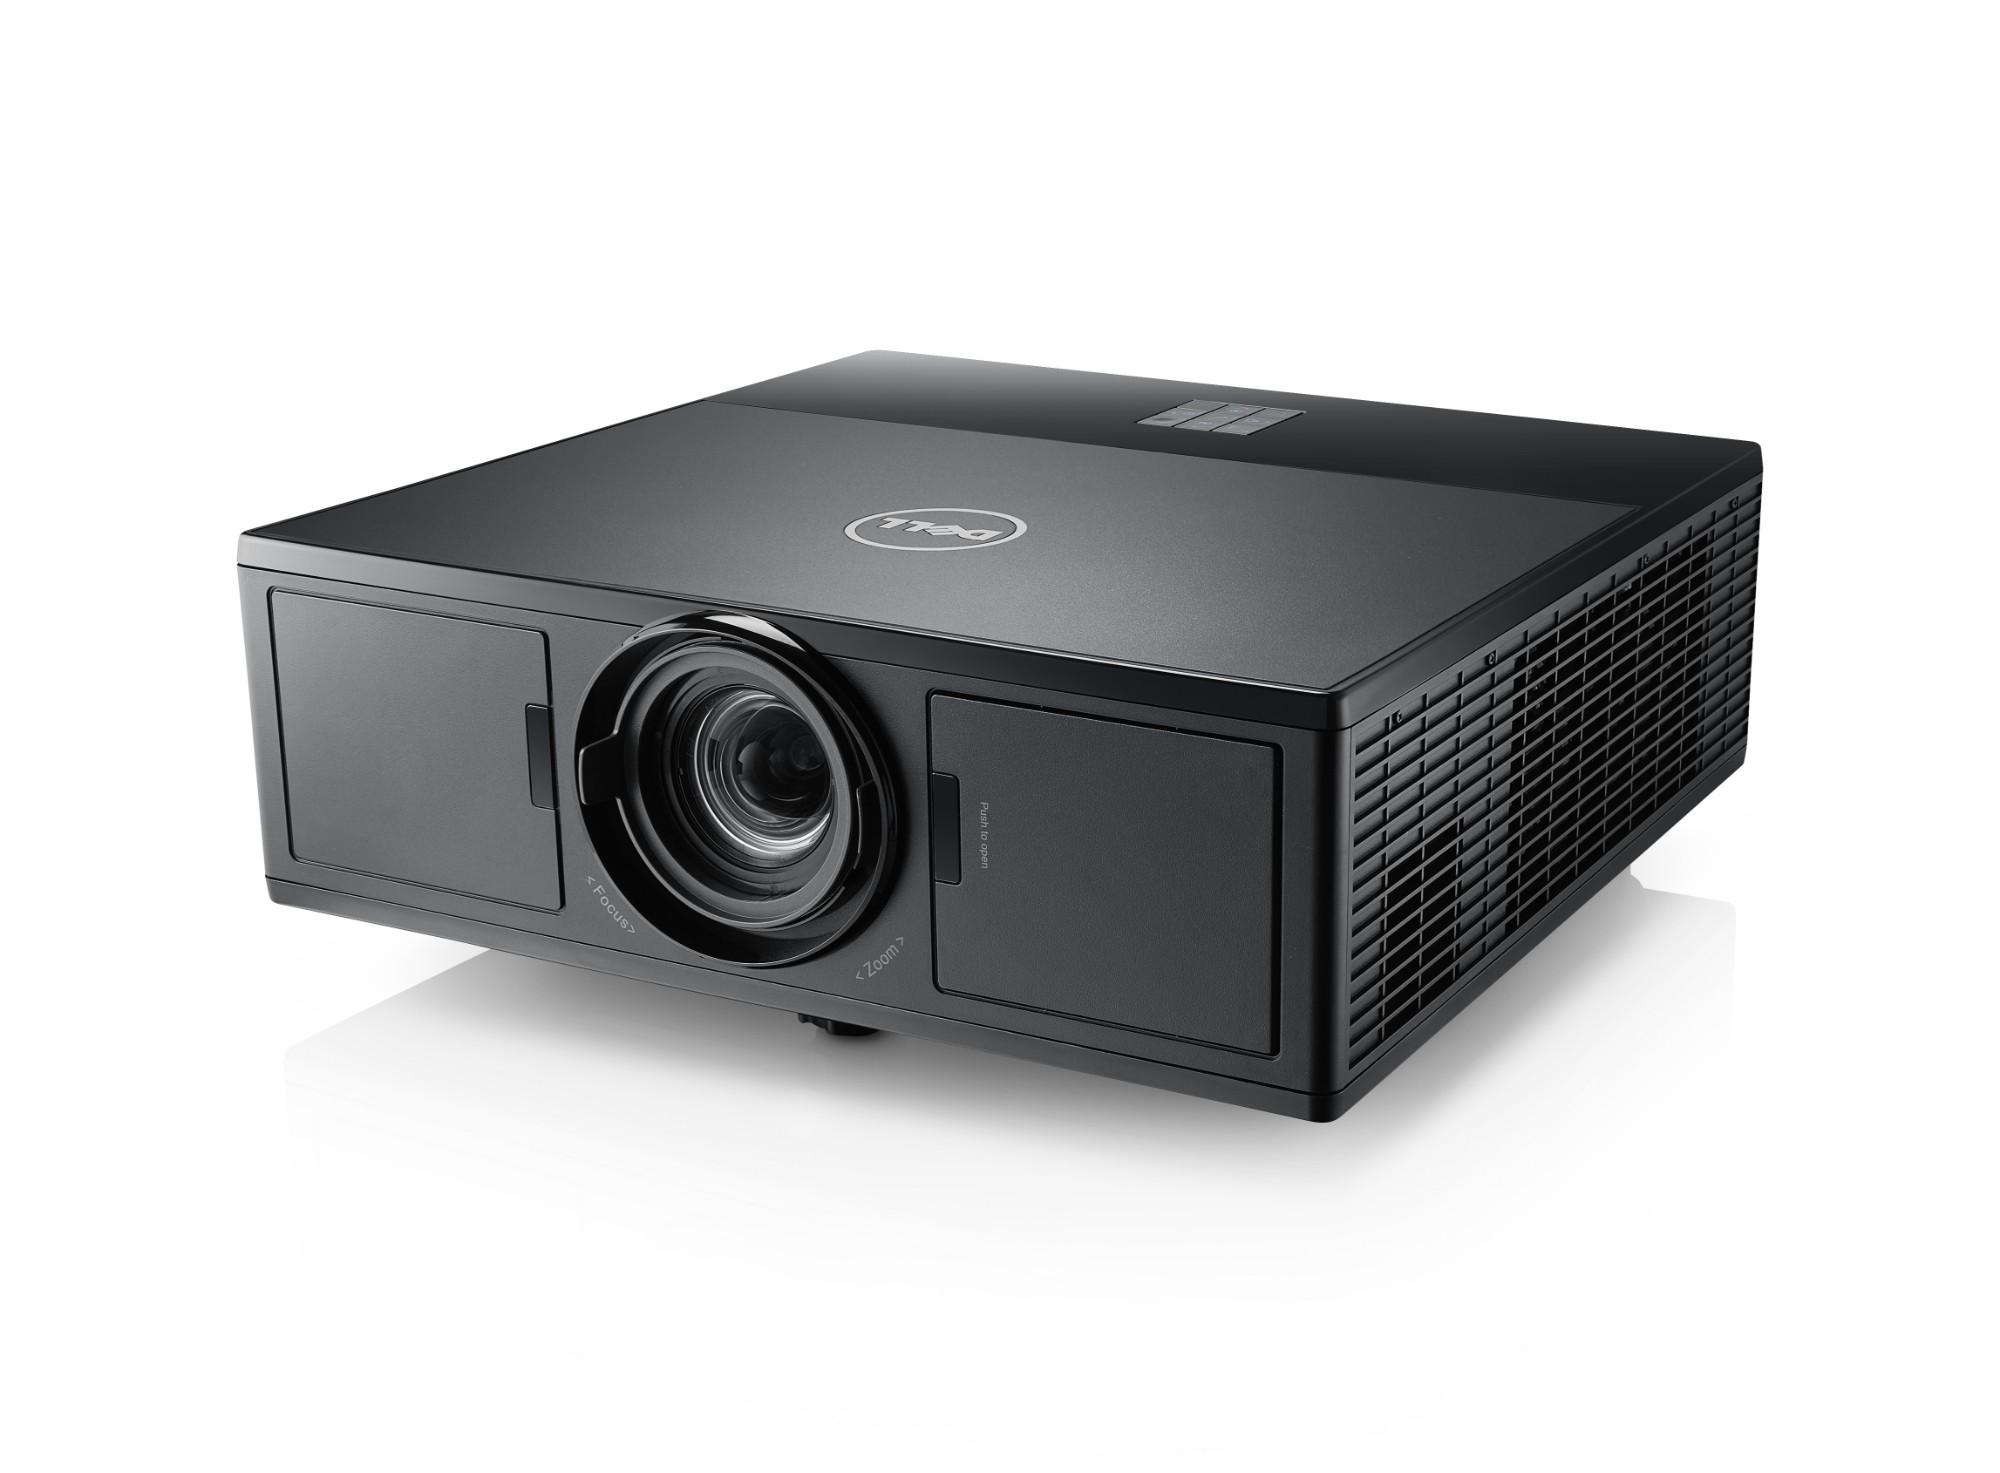 Dell Advanced Projector 7760